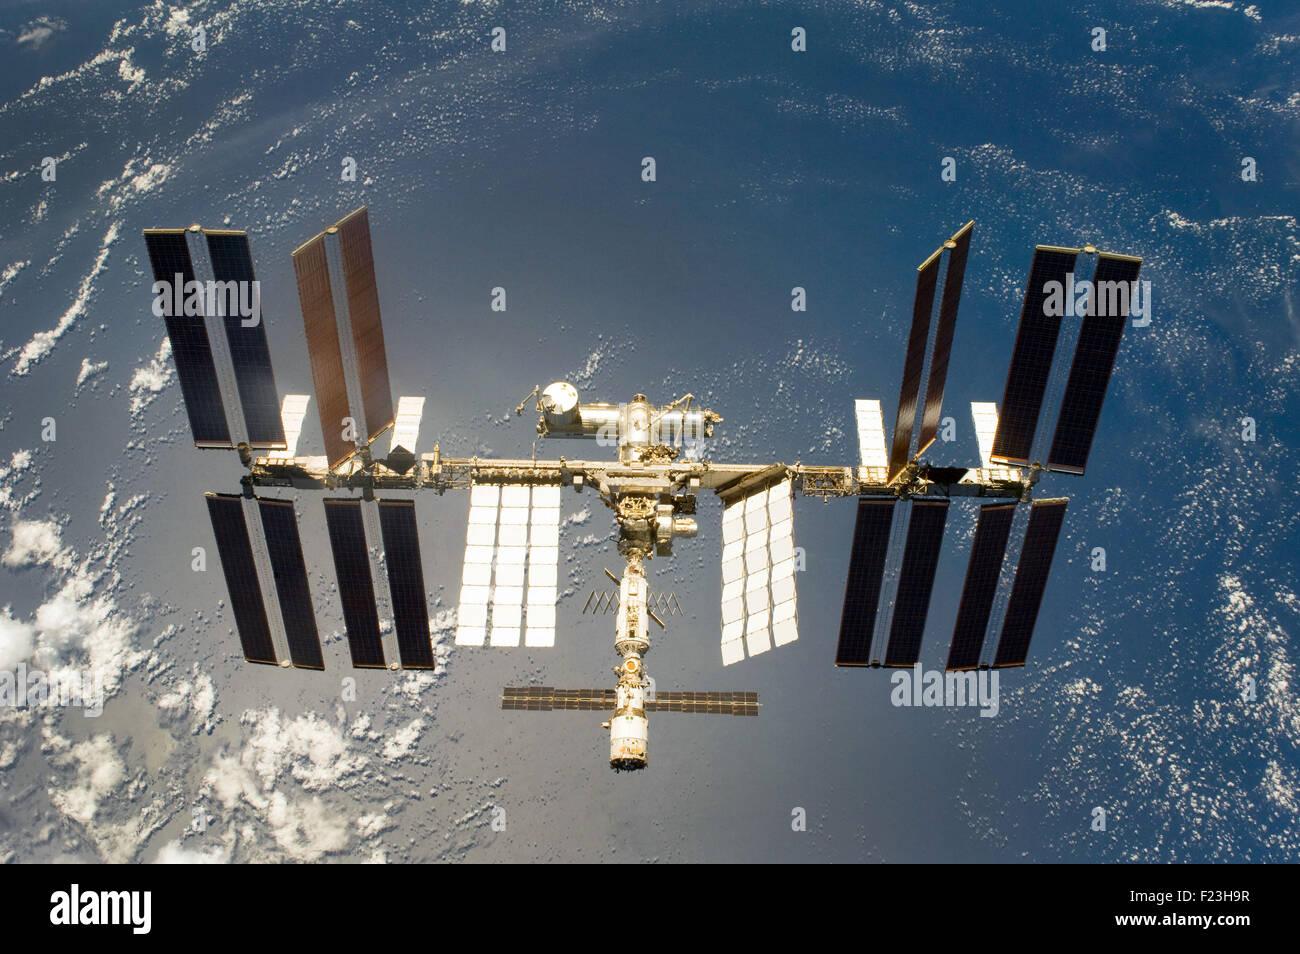 International Space Station. Optimised version of original NASA image - Stock Image